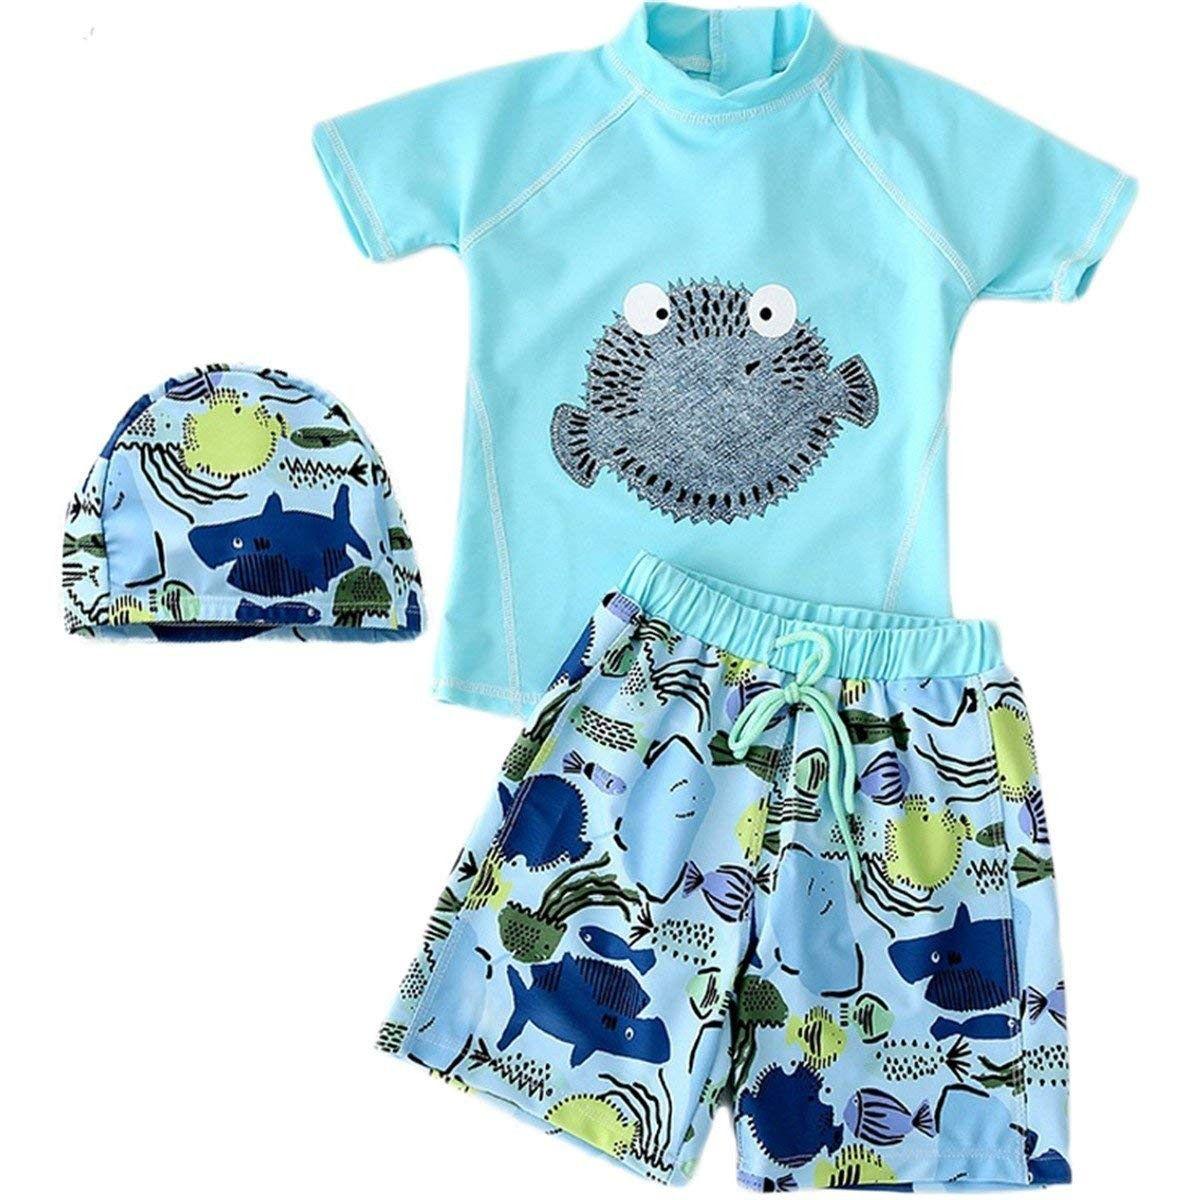 74f73e7215 Baby Kids Boys Two Pieces Short Sleeve Uv Rash Guard Swimwear Sun Protection  Cartoon Swimsuit with